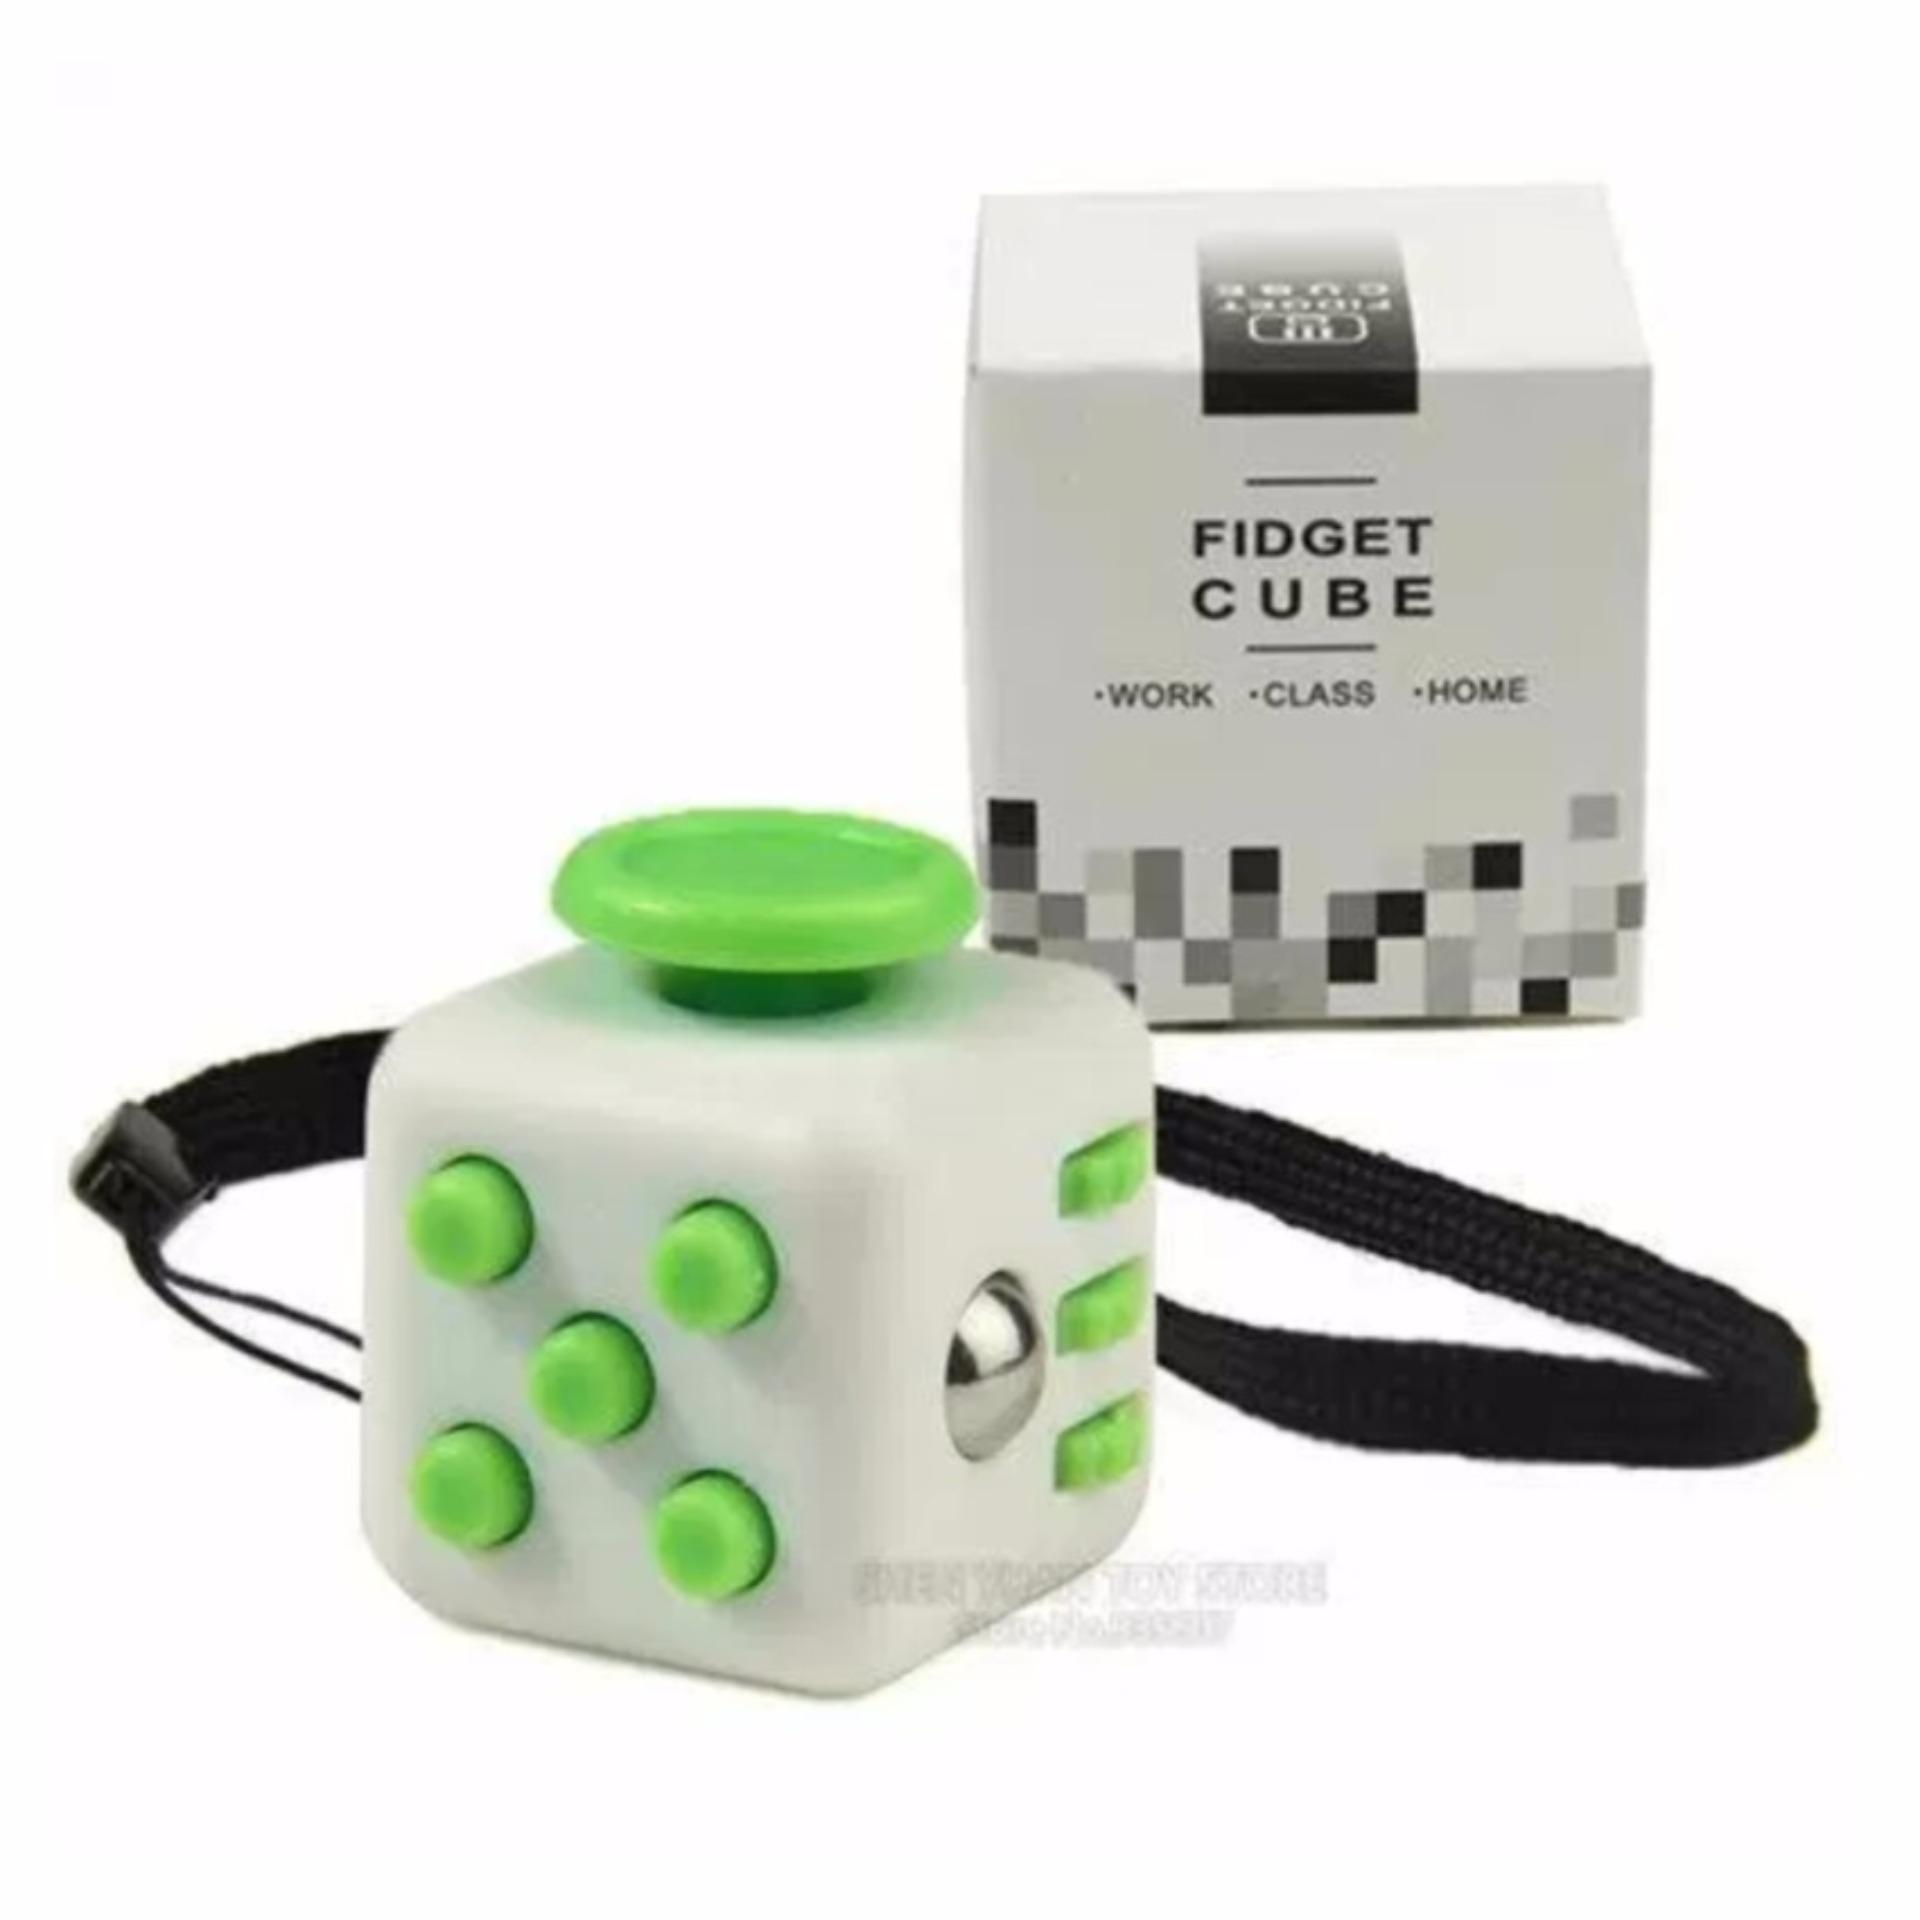 Fidget Cube Kickstarter Finger Toys Therapy Mainan Vinyl Desk Stress Sohoku Spinner Anti Model Batman Relief Random